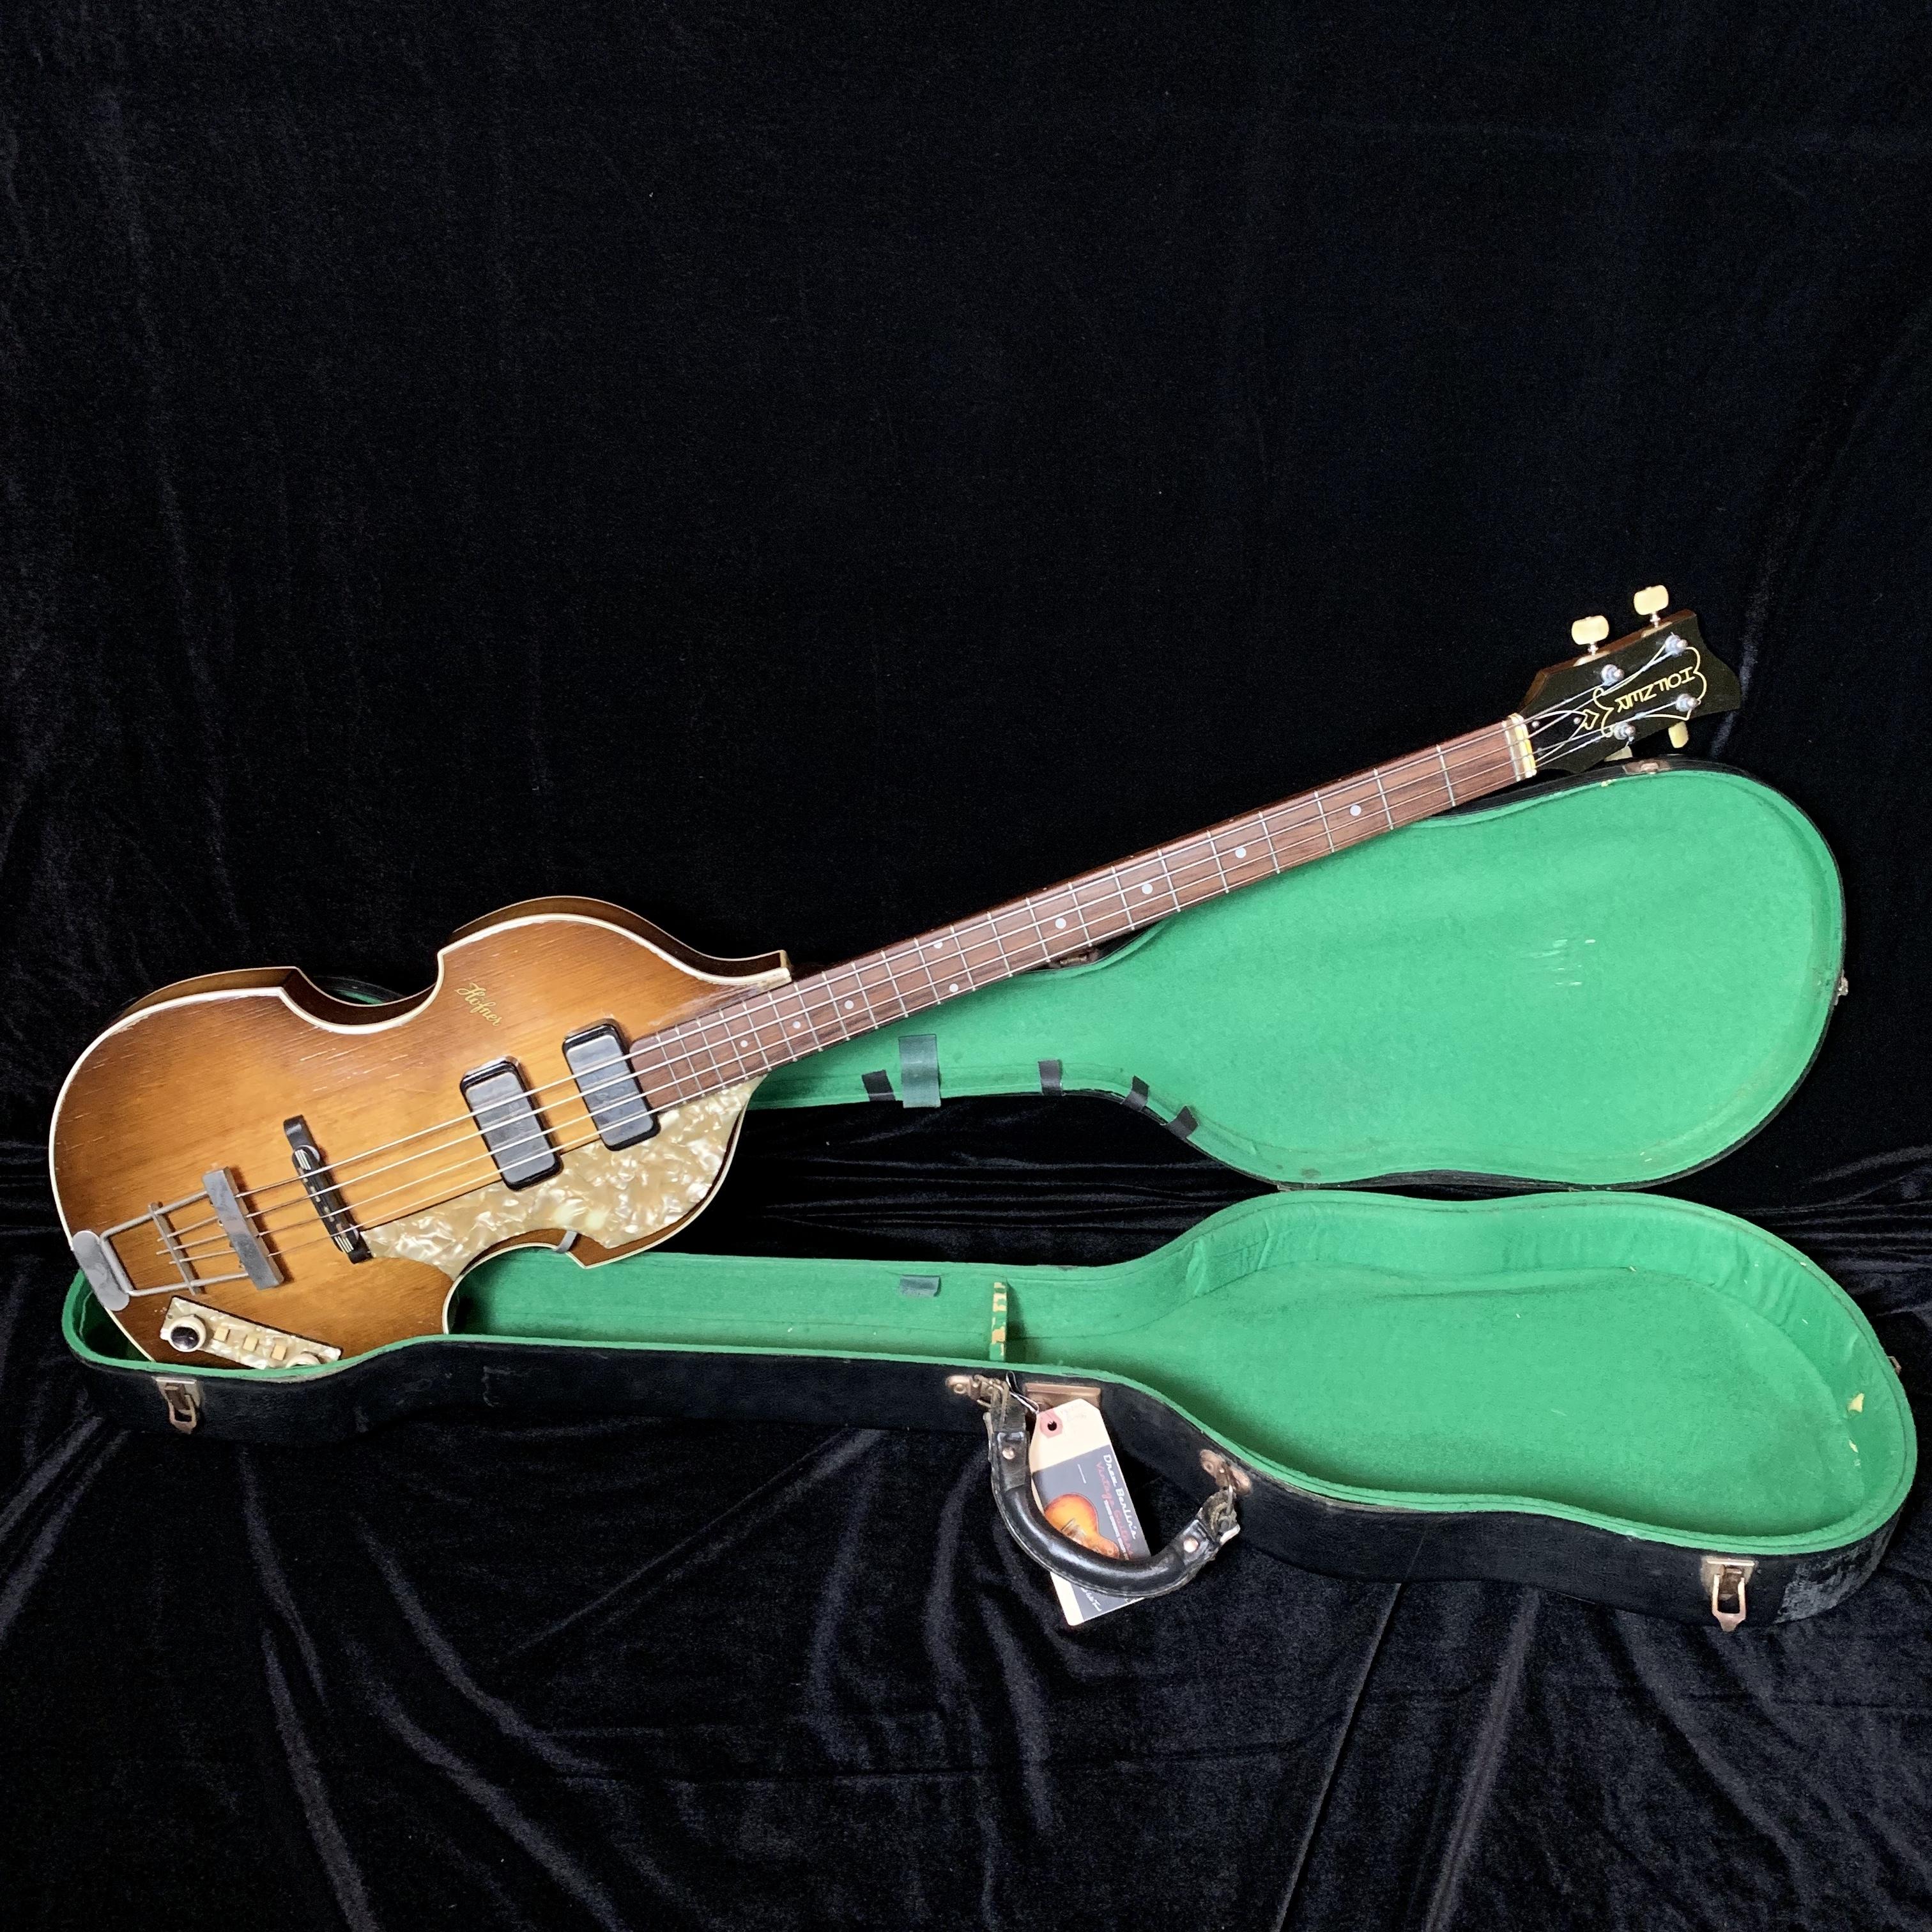 1962/63 Hofner Cavern Bass SN# 082